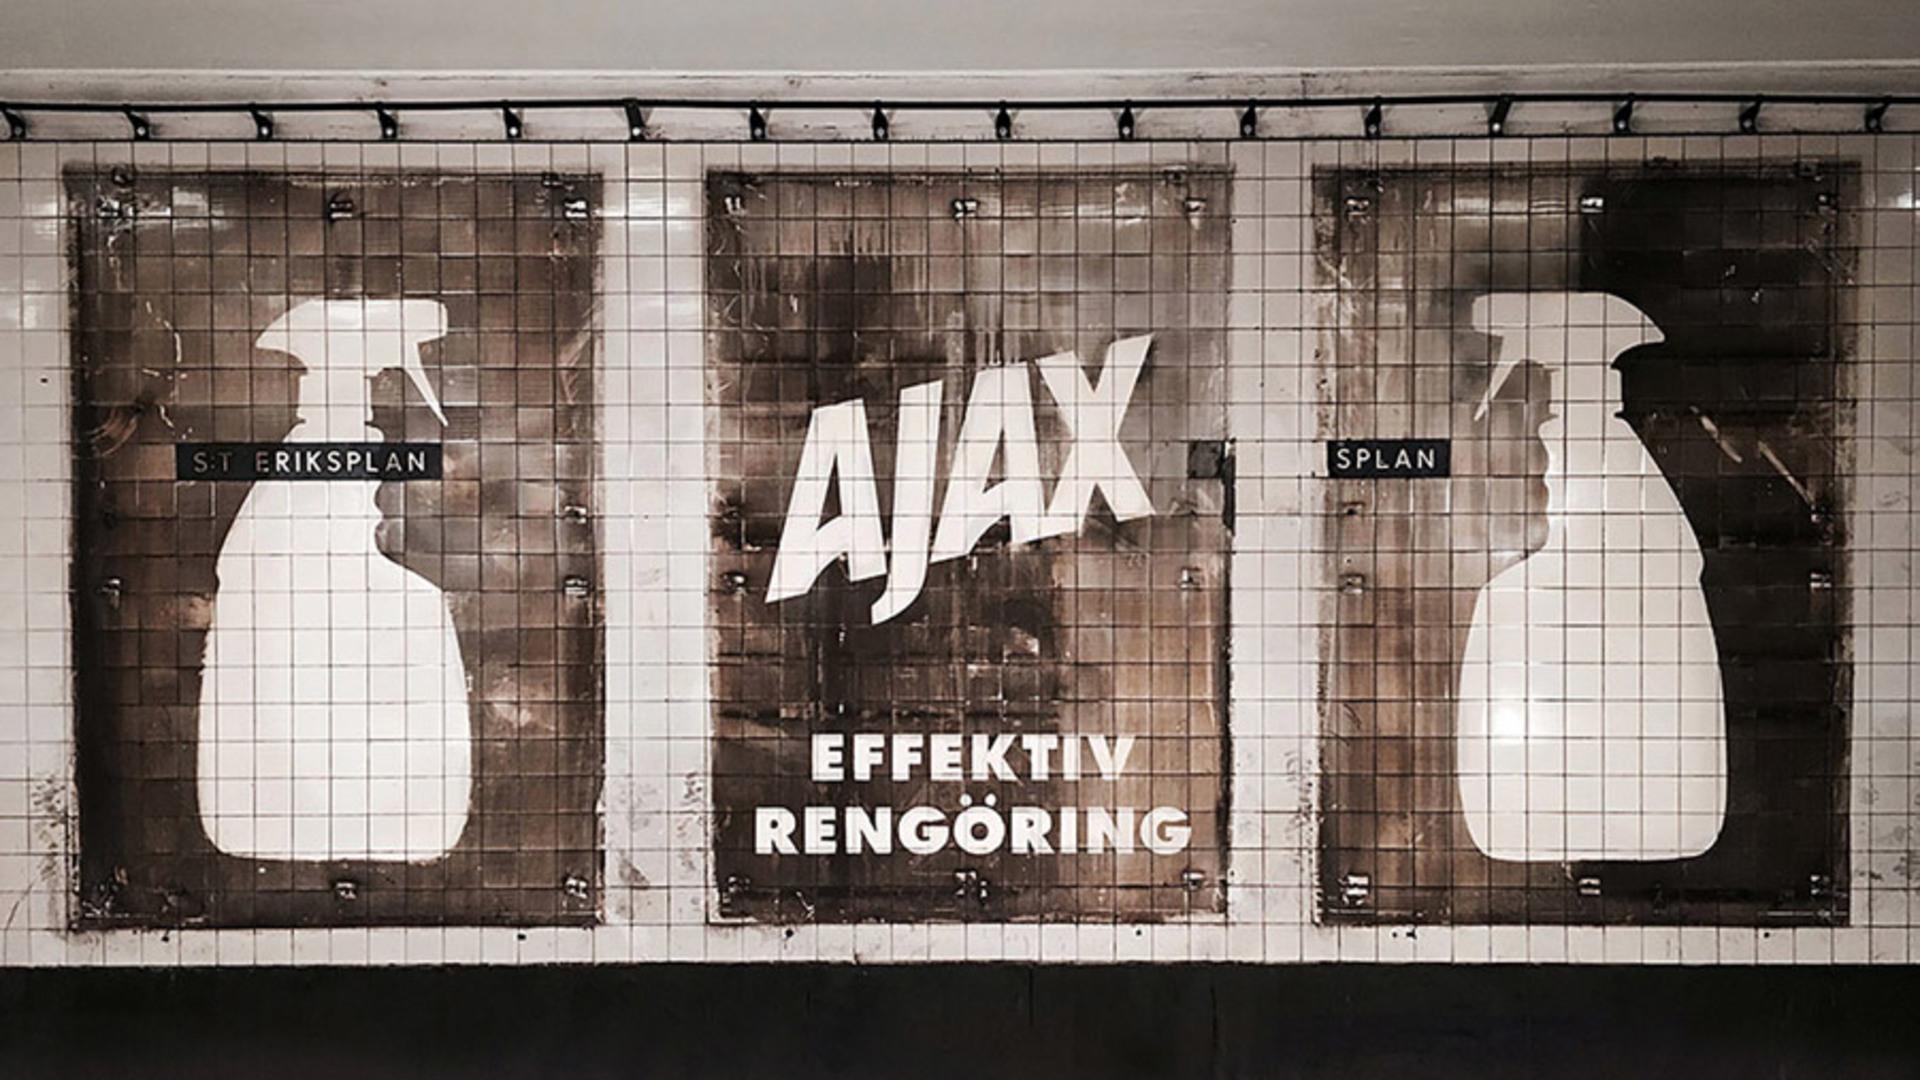 The clean art craze: reverse graffiti is the transient artform responding to urban dirt